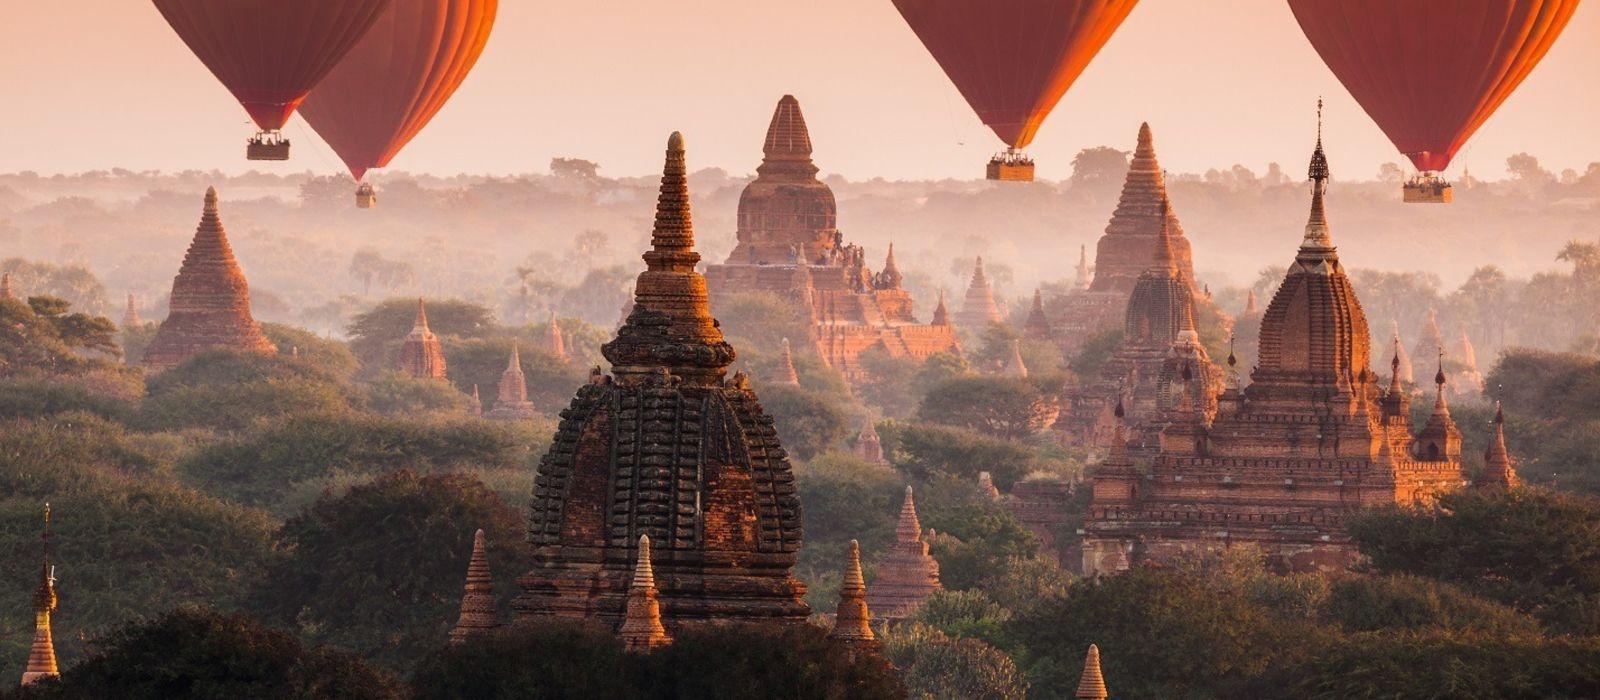 Hot air balloon over Bagan in misty morning, Myanmar, Asia